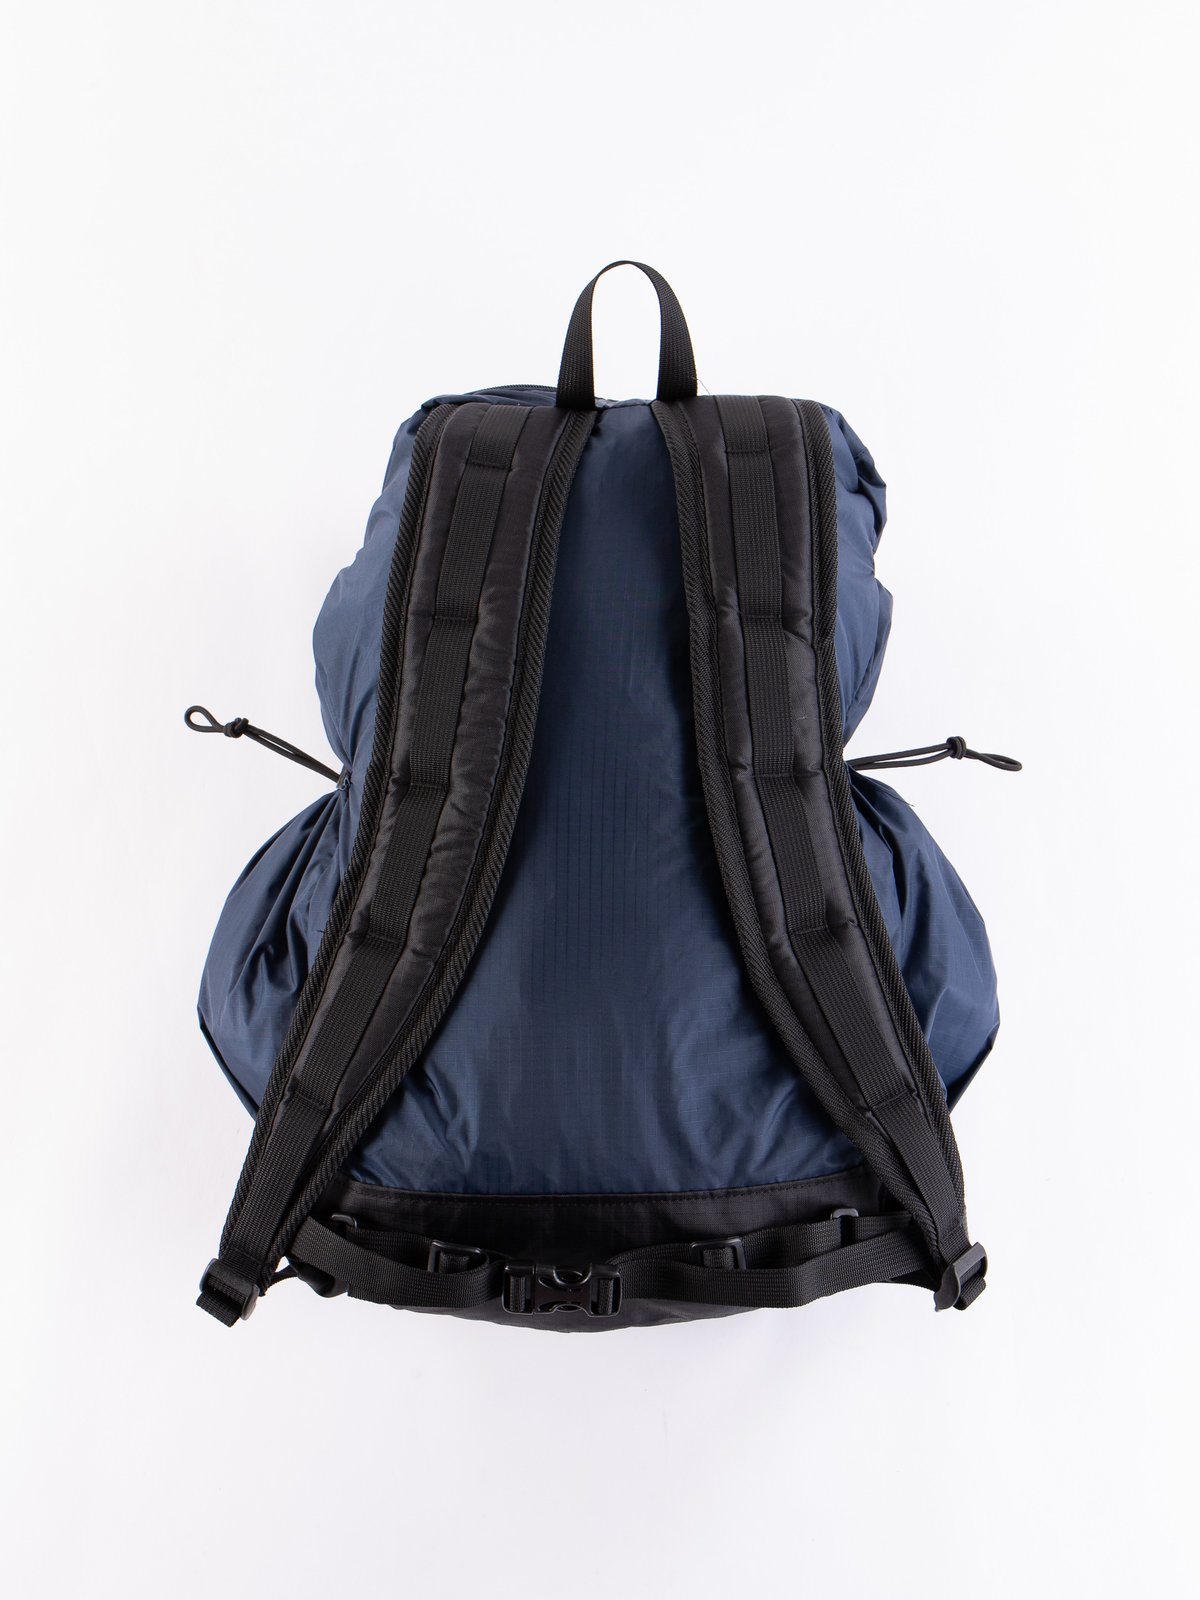 Navy Nylon Ripstop UL Backpack - Image 3